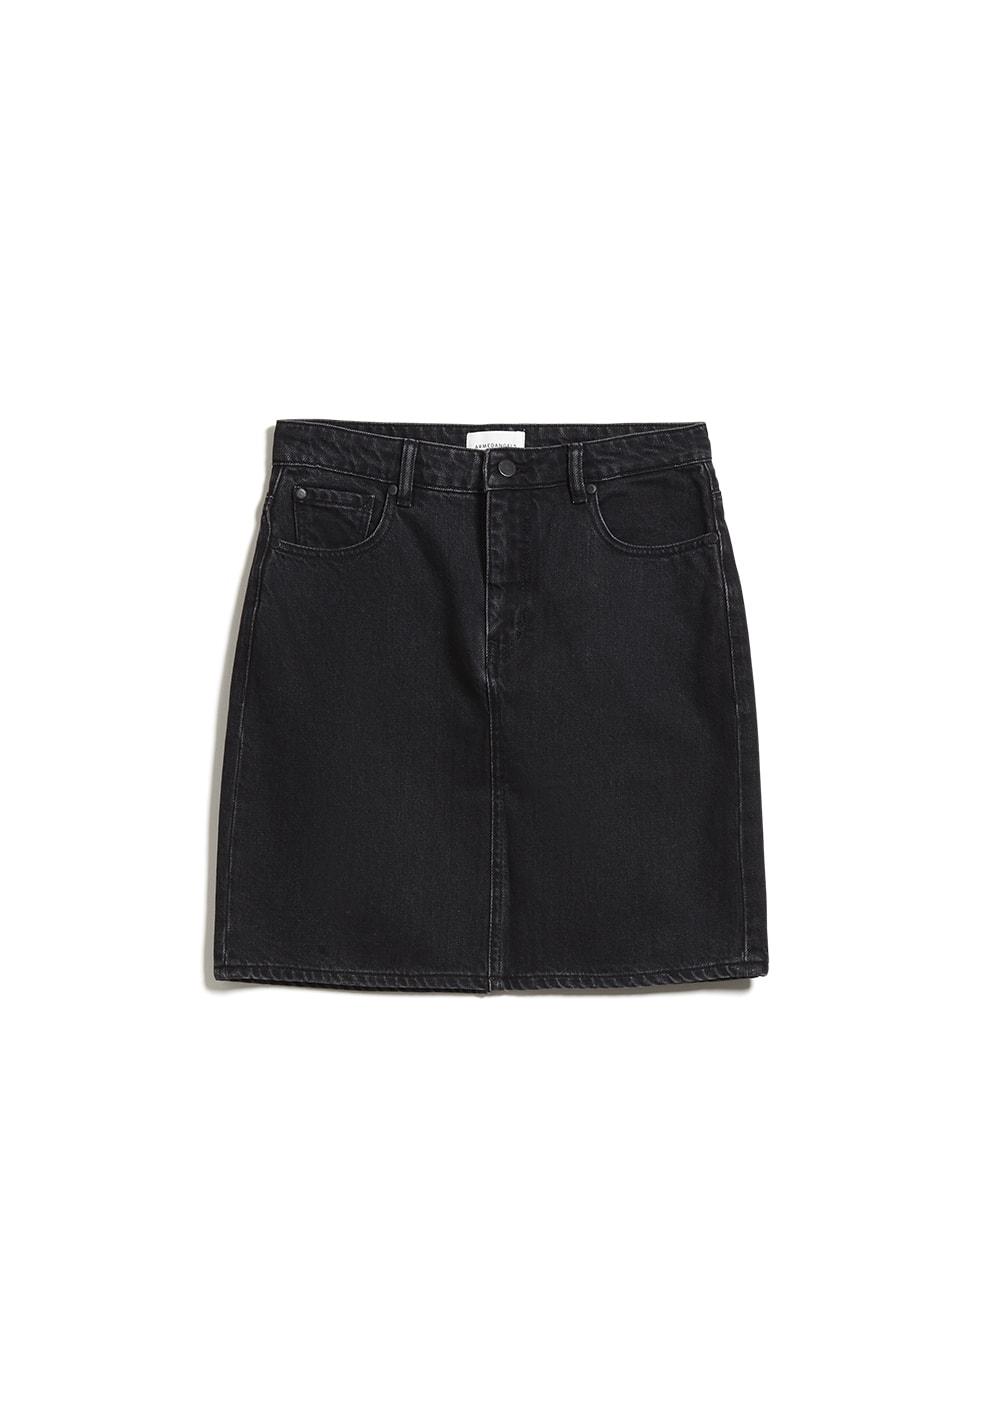 AAVA Denim Skirt made of Organic Cotton